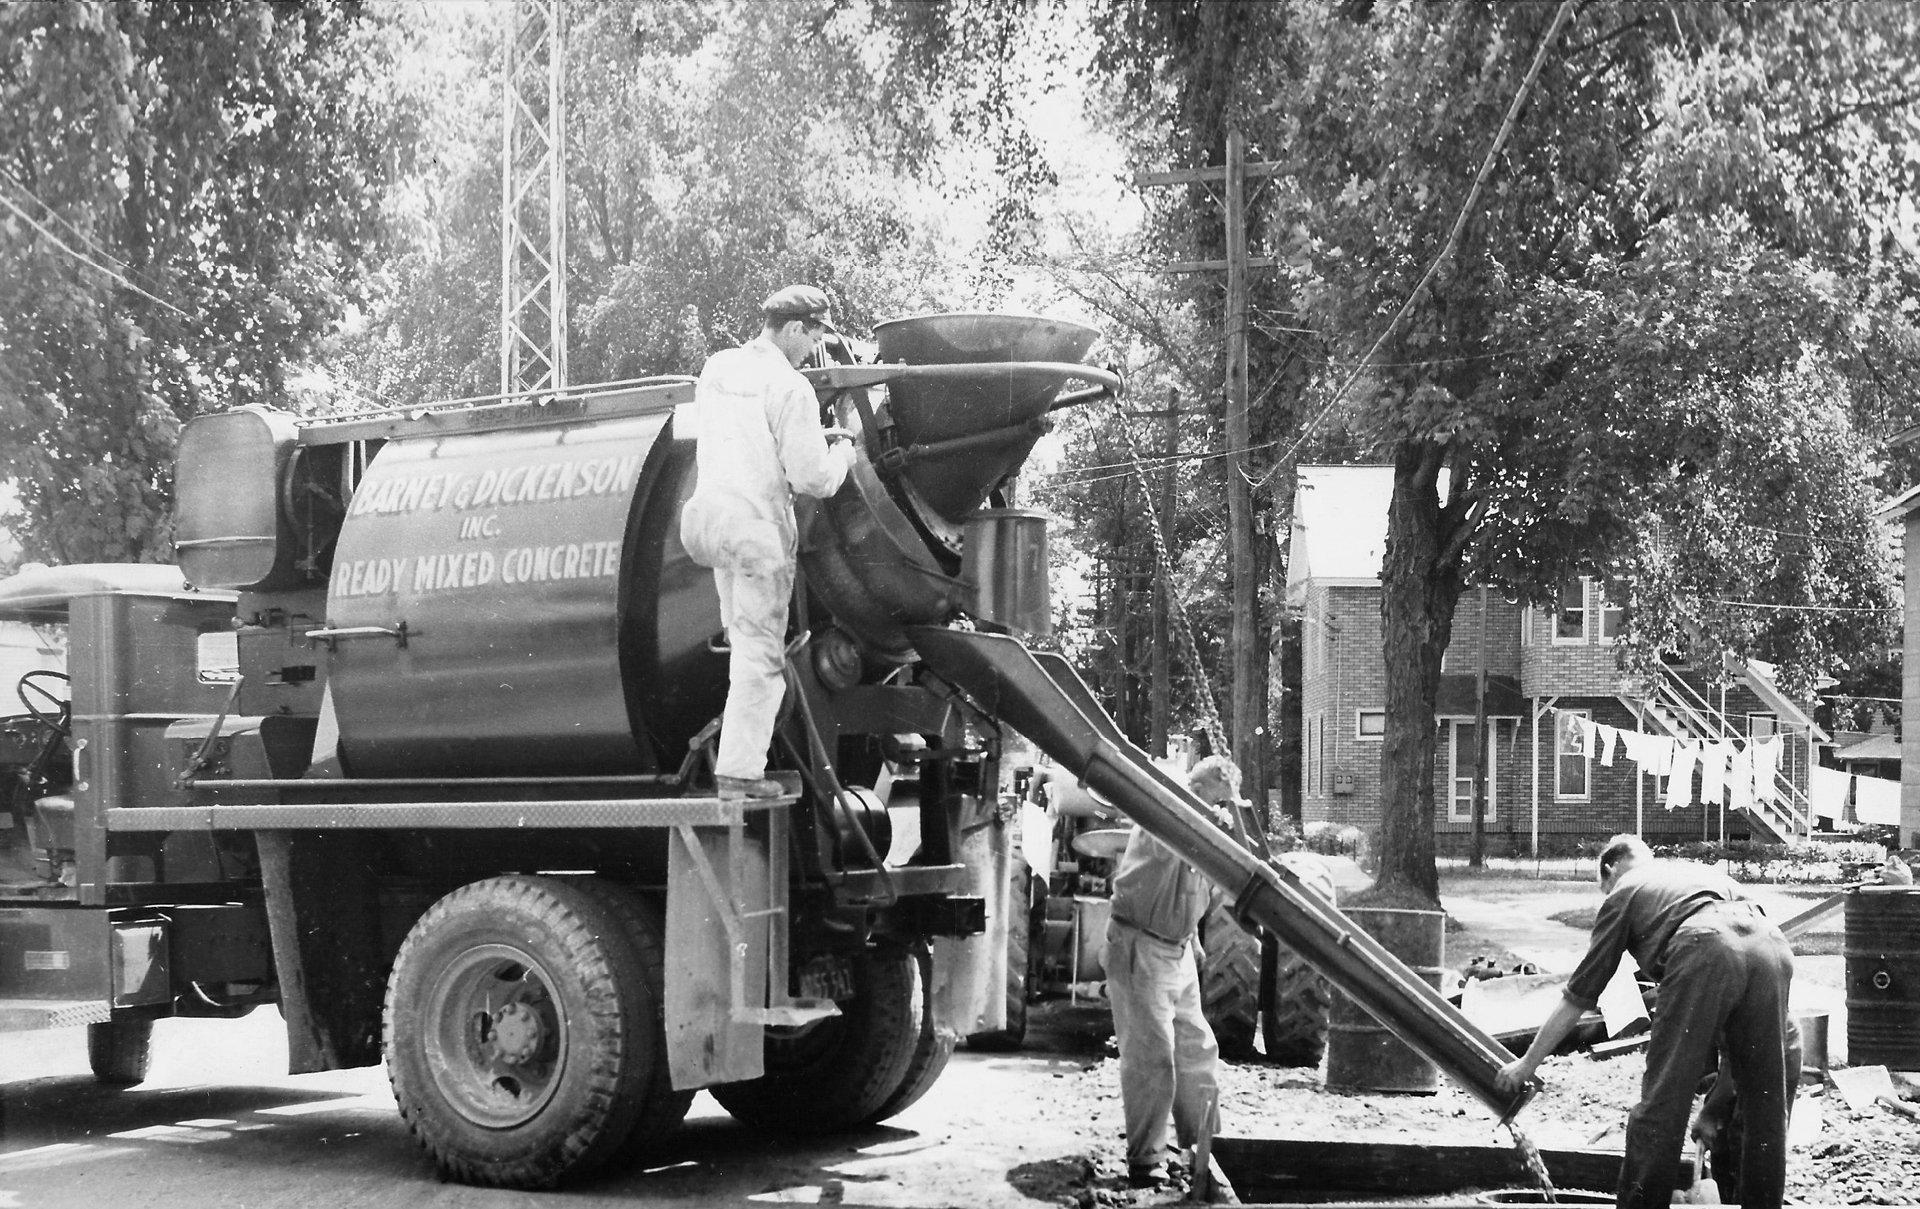 Barney & Dickenson Inc vehicle